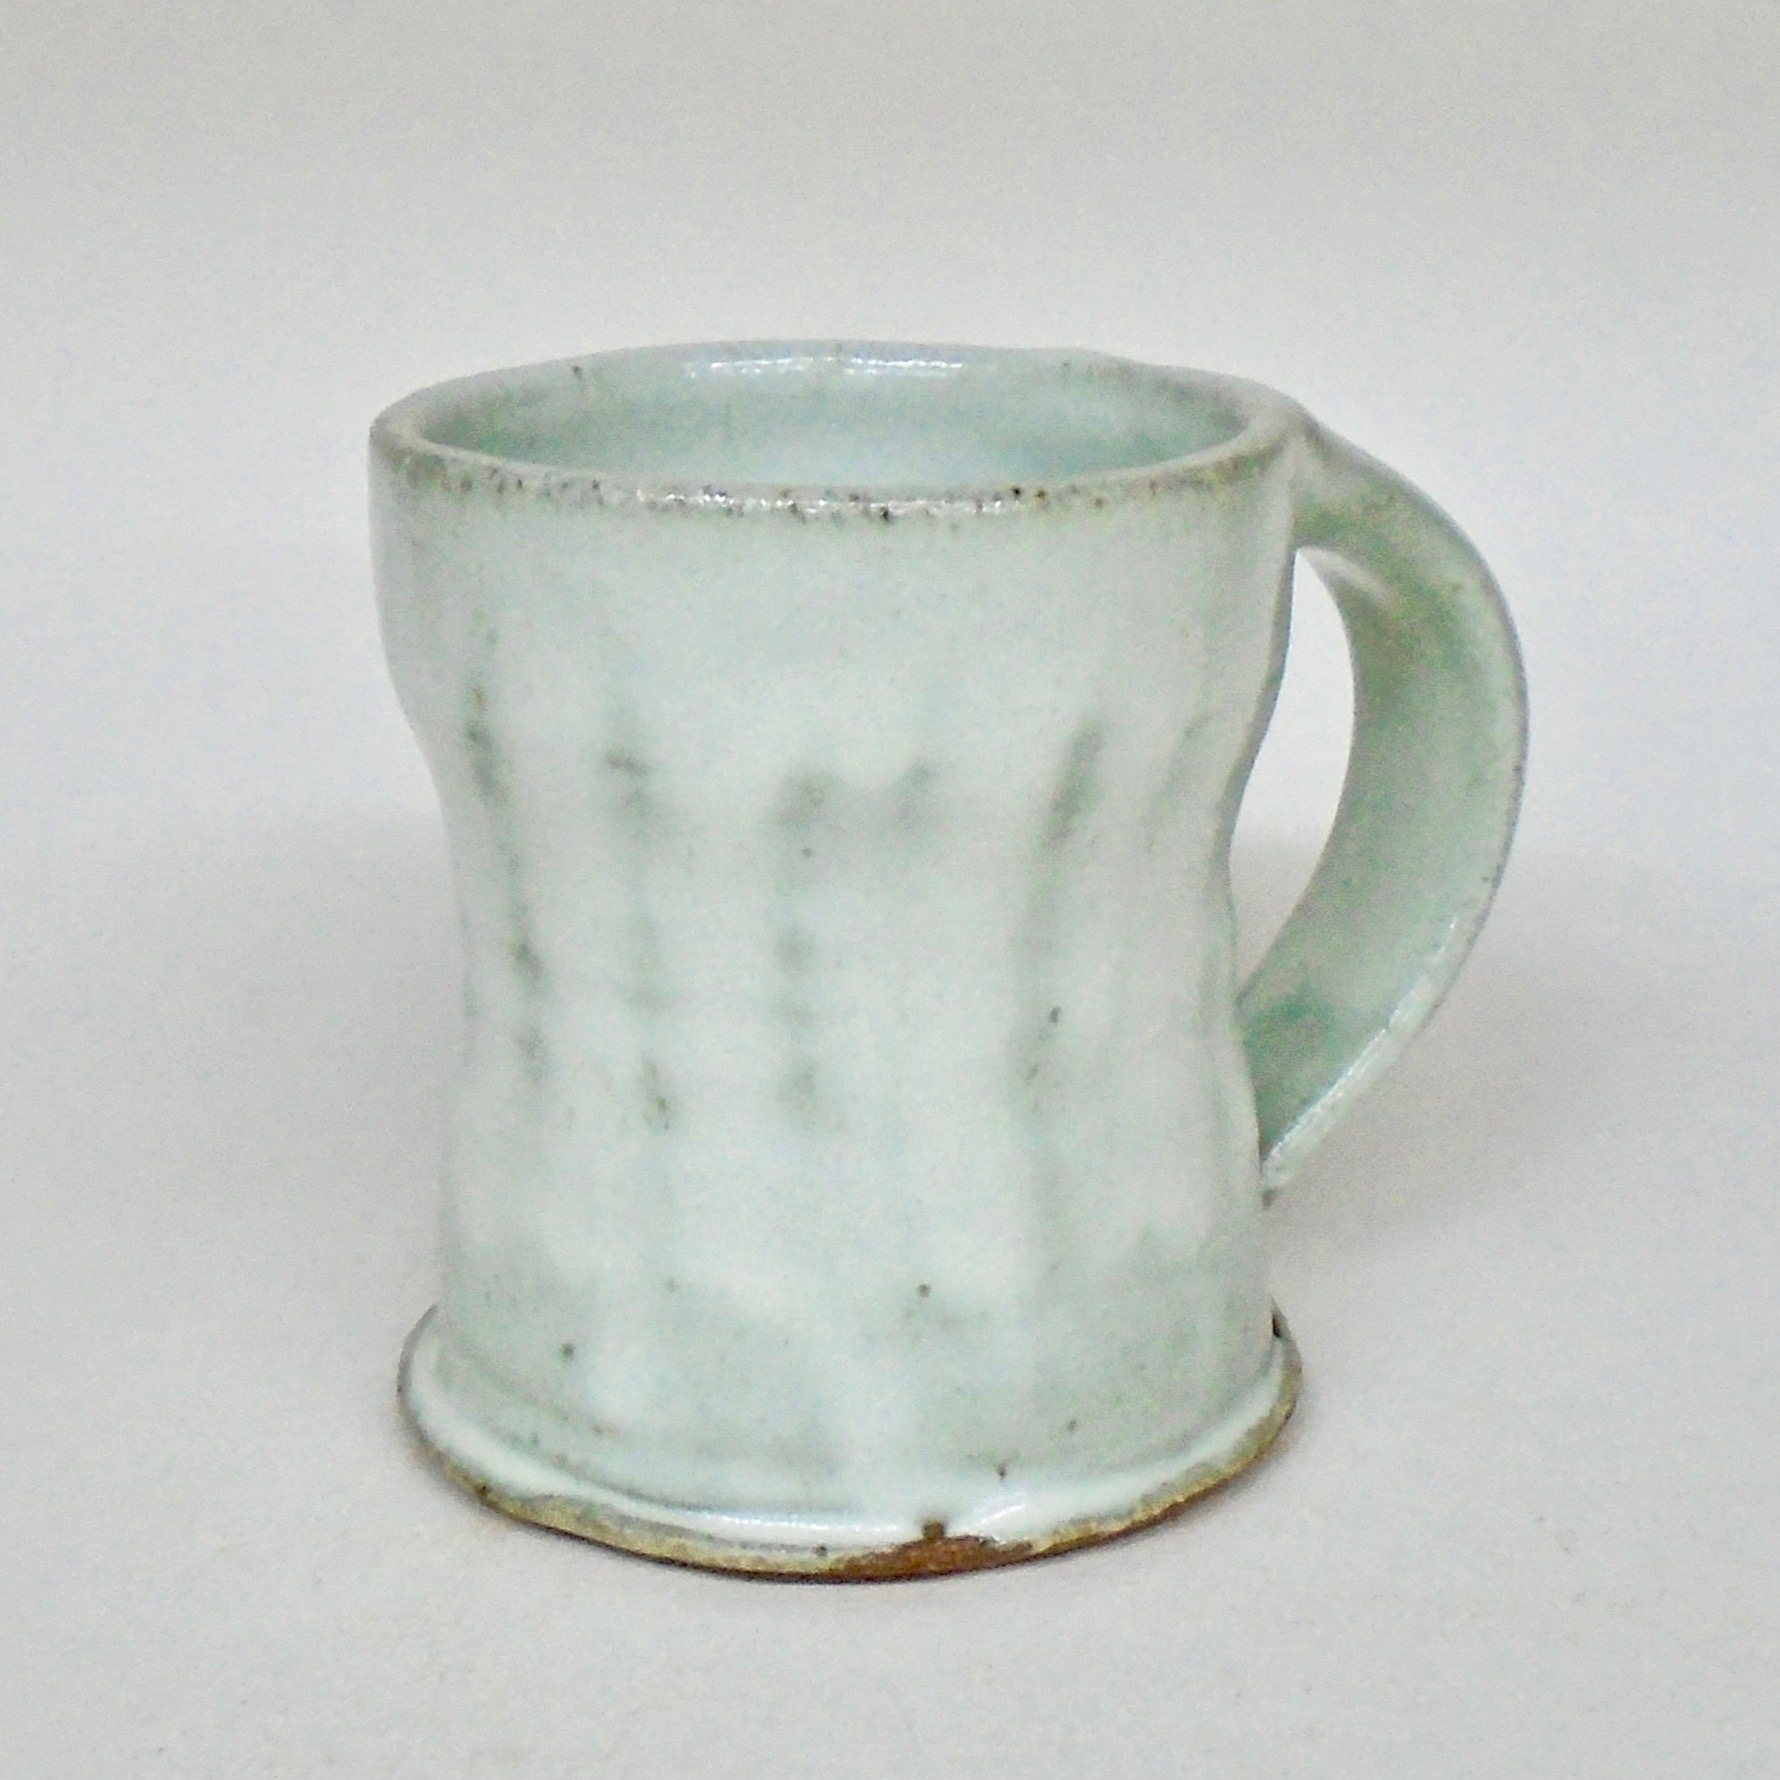 JL59: Anne's White Mug